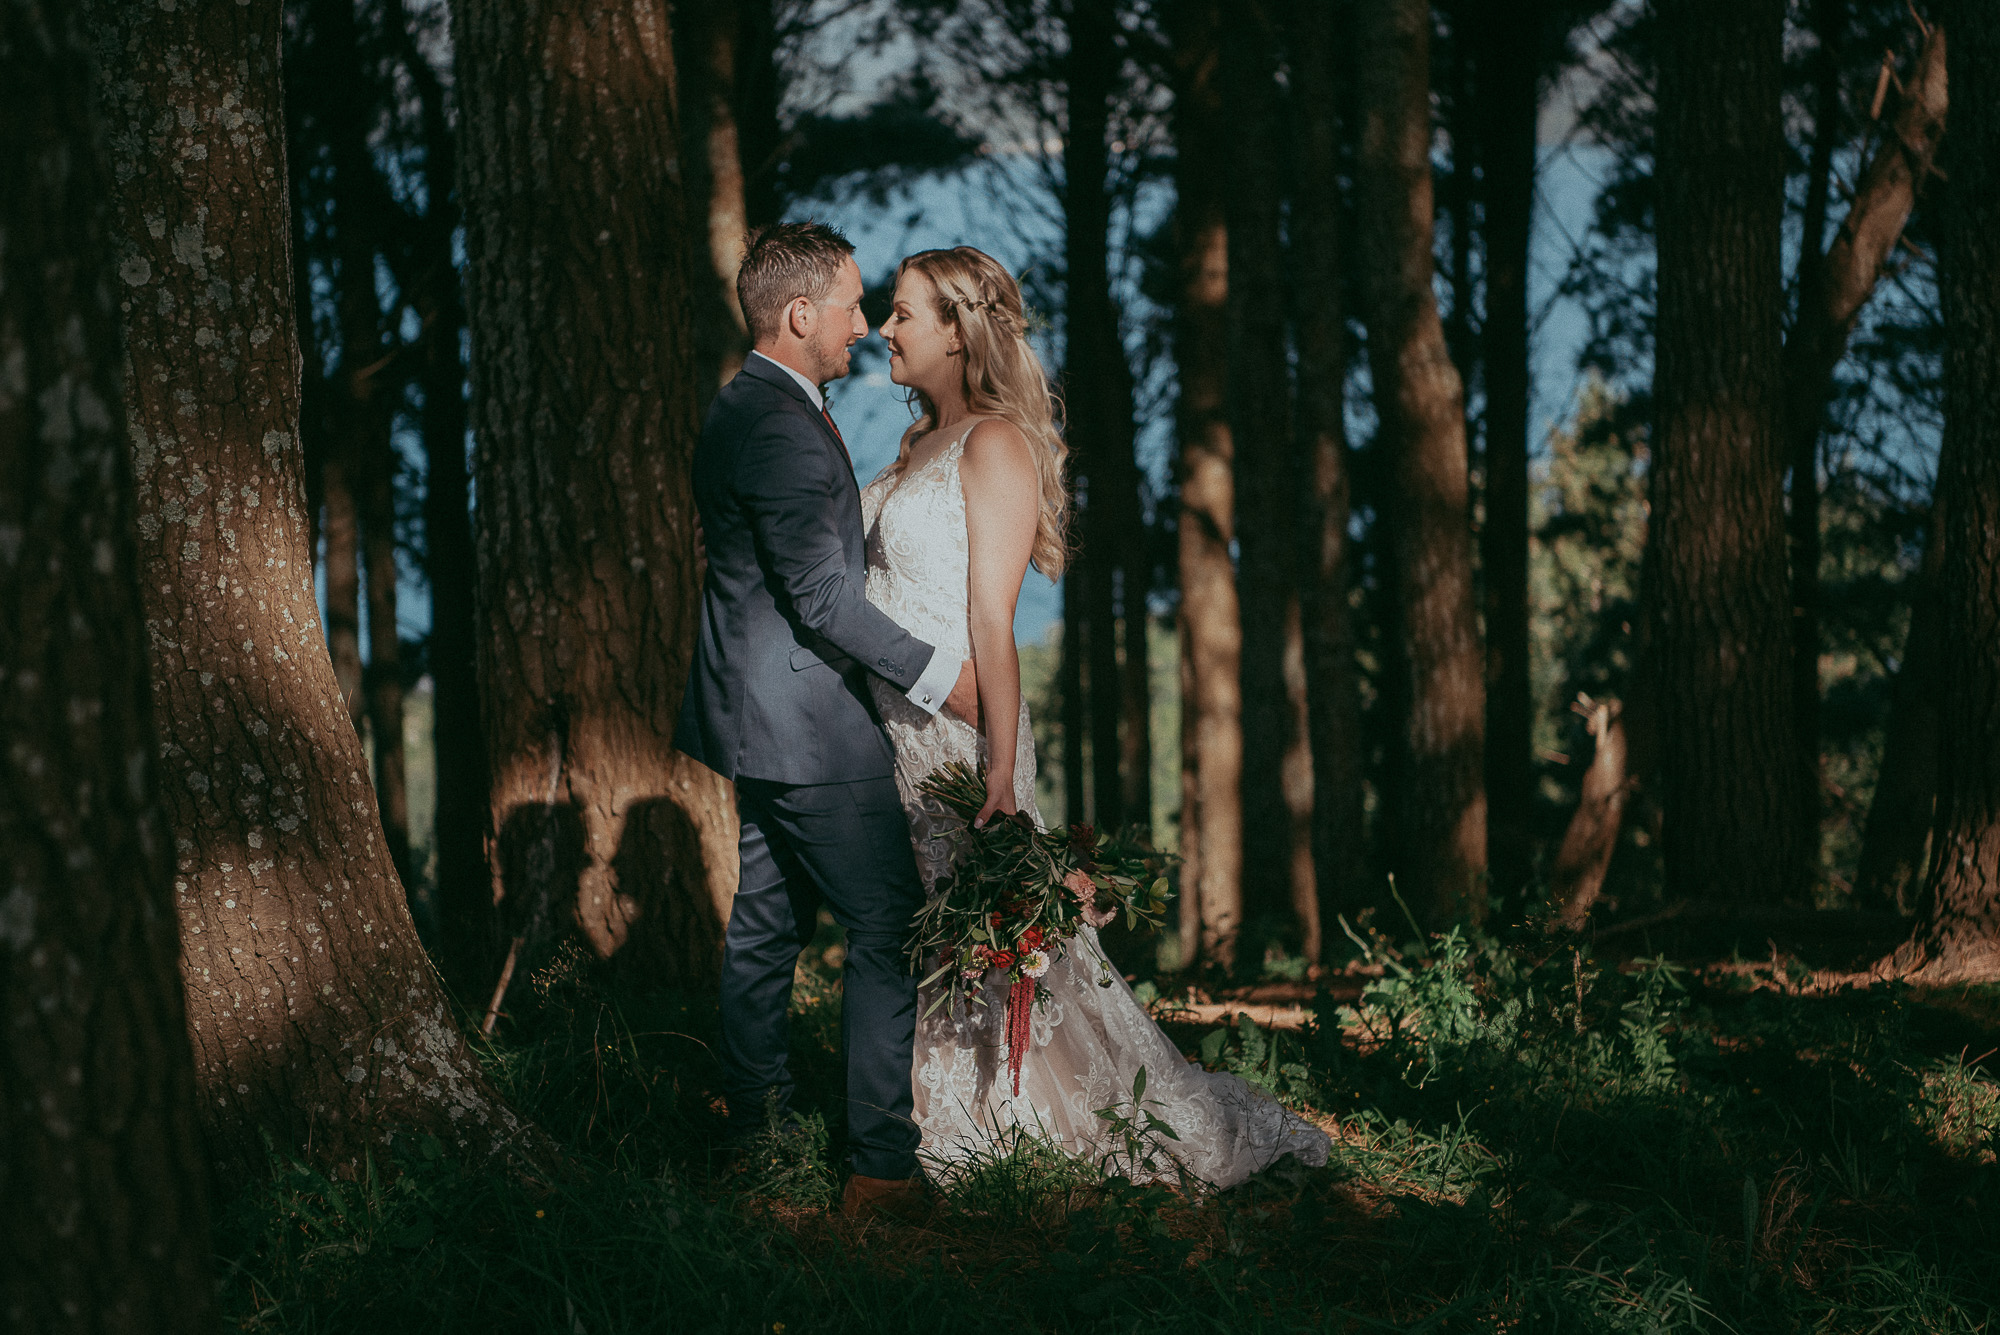 wedding-by-levien-570.JPG